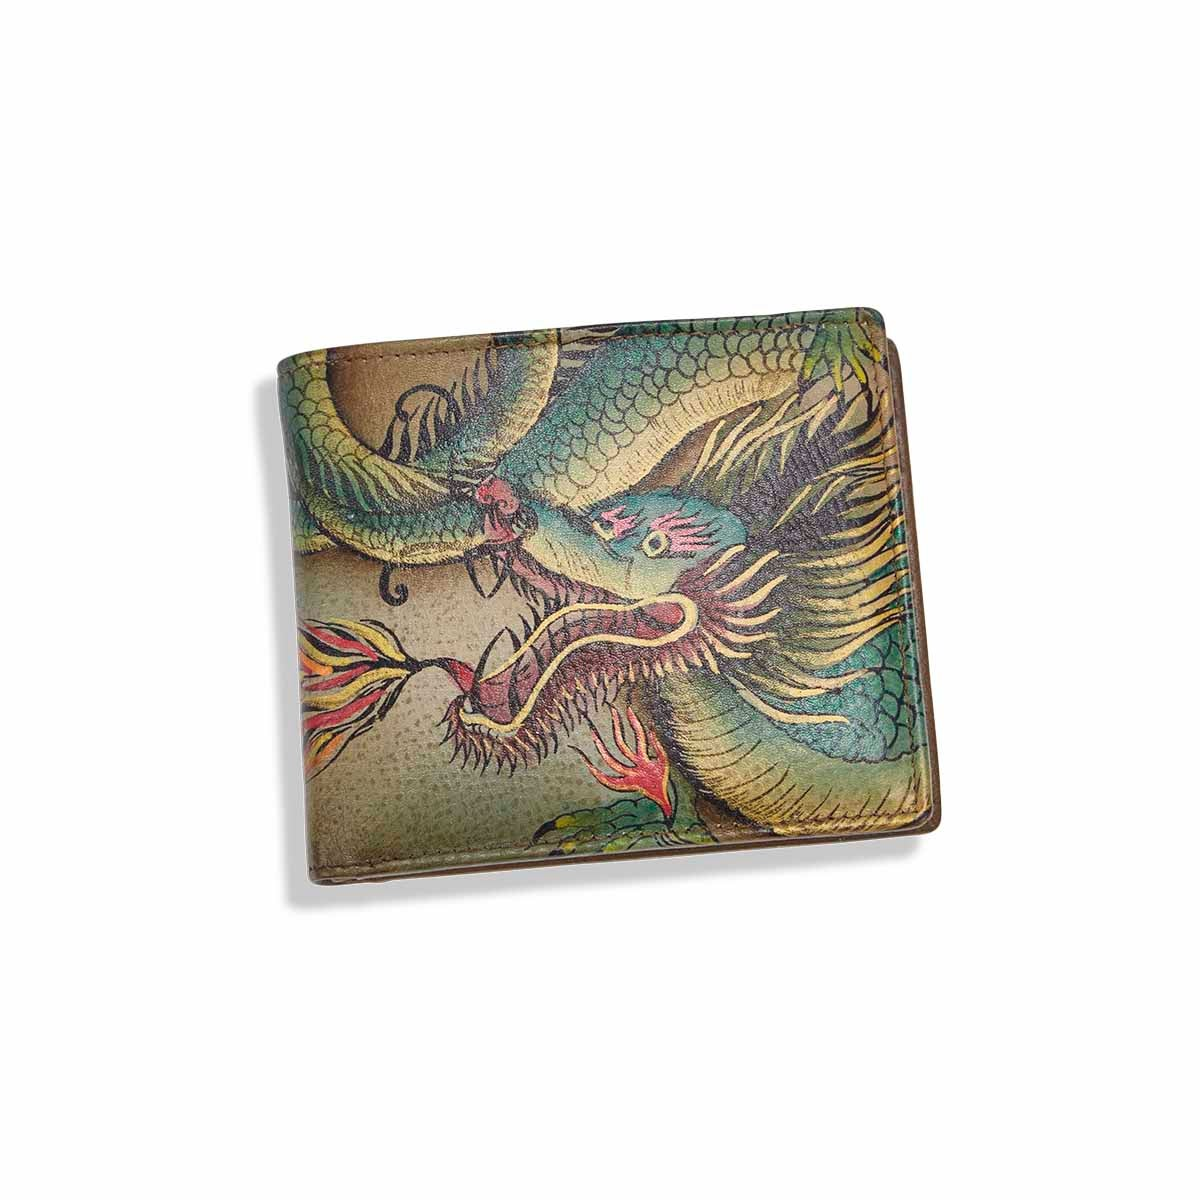 Mns painted lthr Hidden Dragon wallet